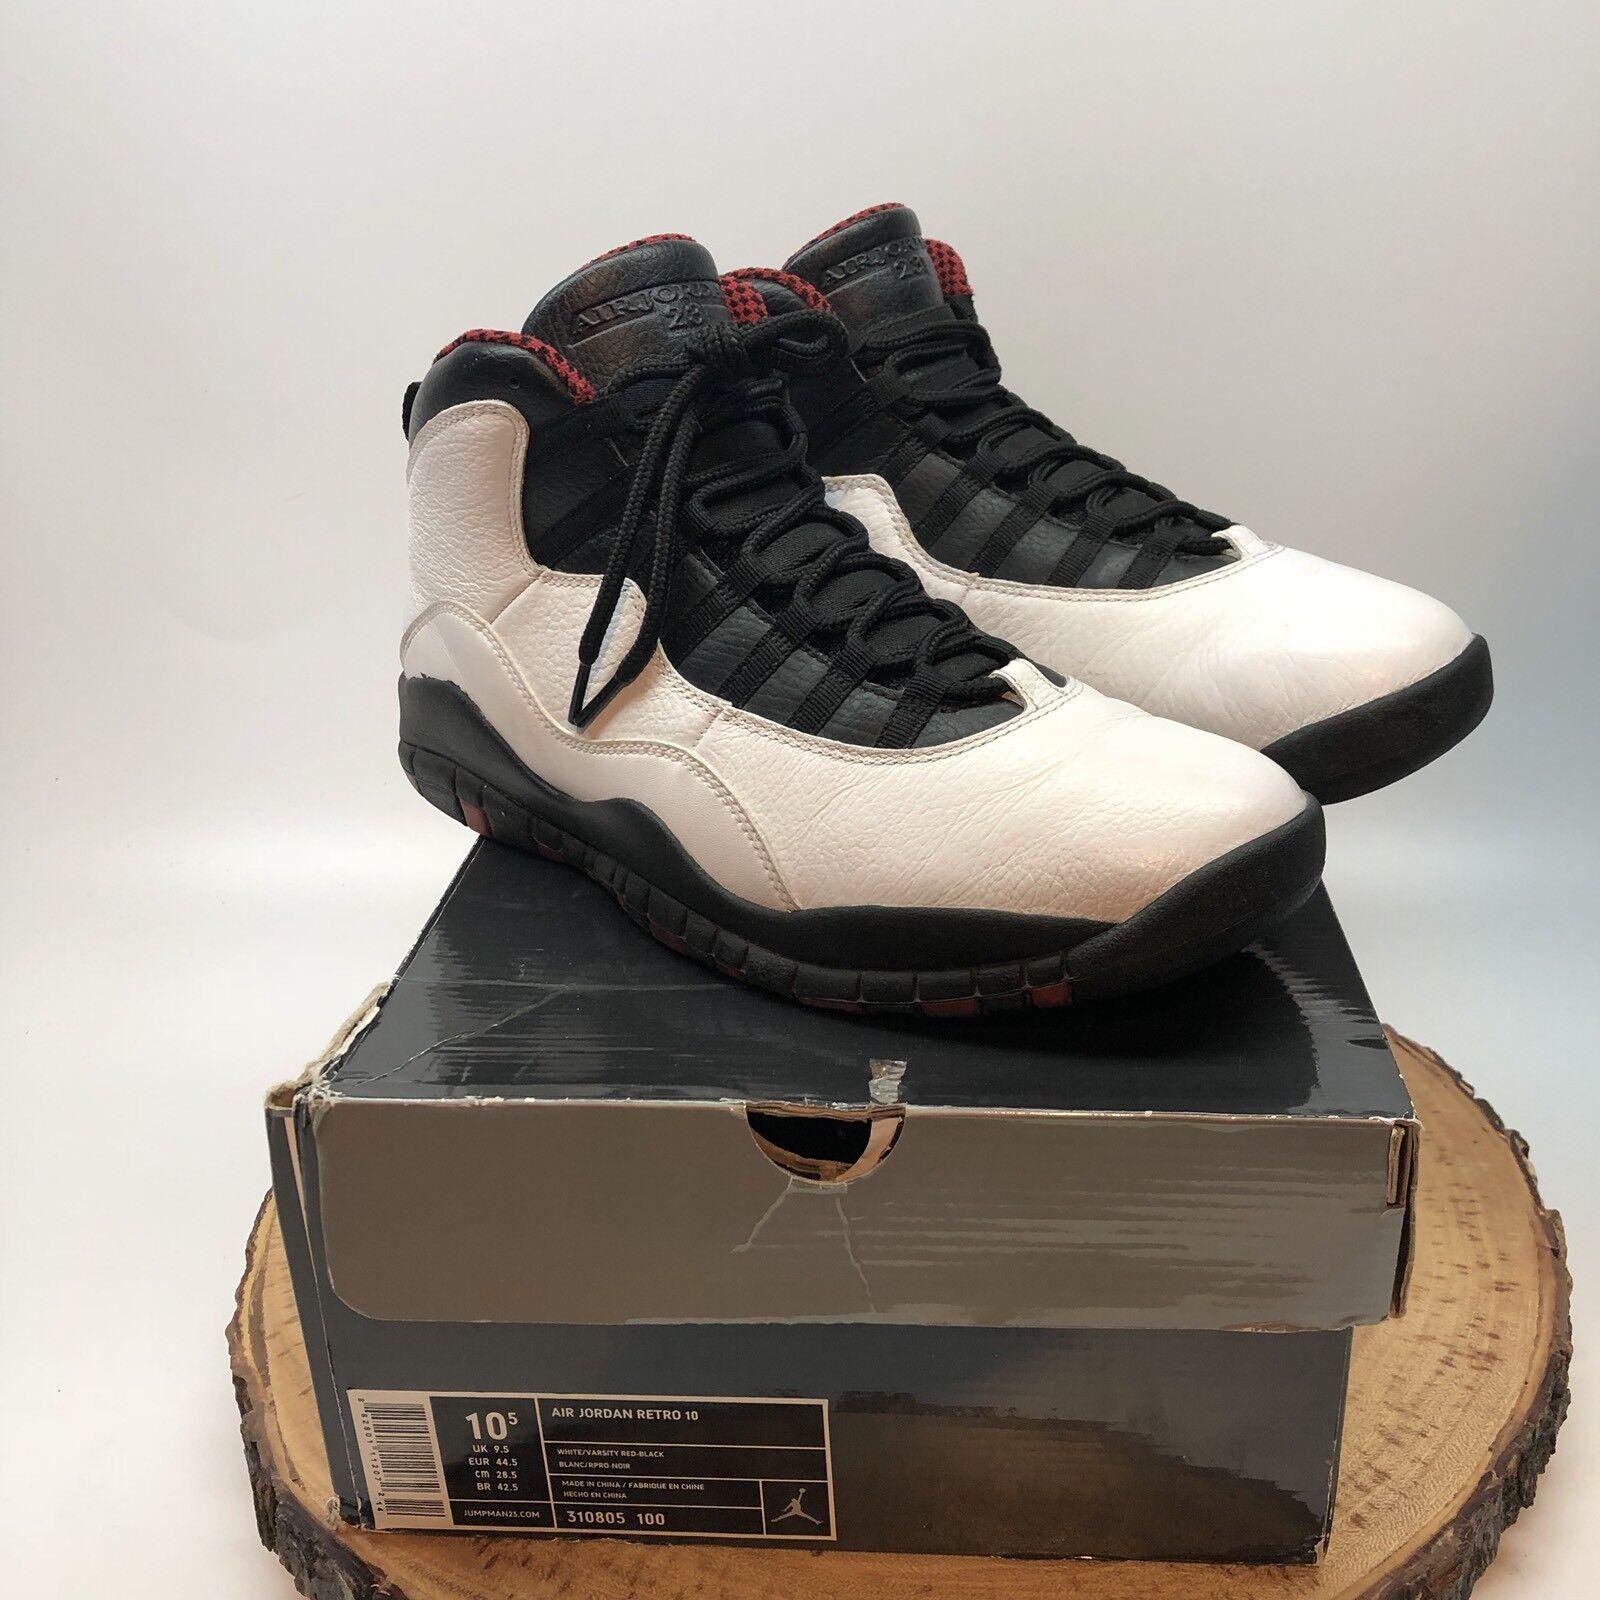 Nike air jordan retro - x chicago bulls weiße weiße bulls schwarz - rot - 310805 100 sz 10,5 xi - xii 1e56d7